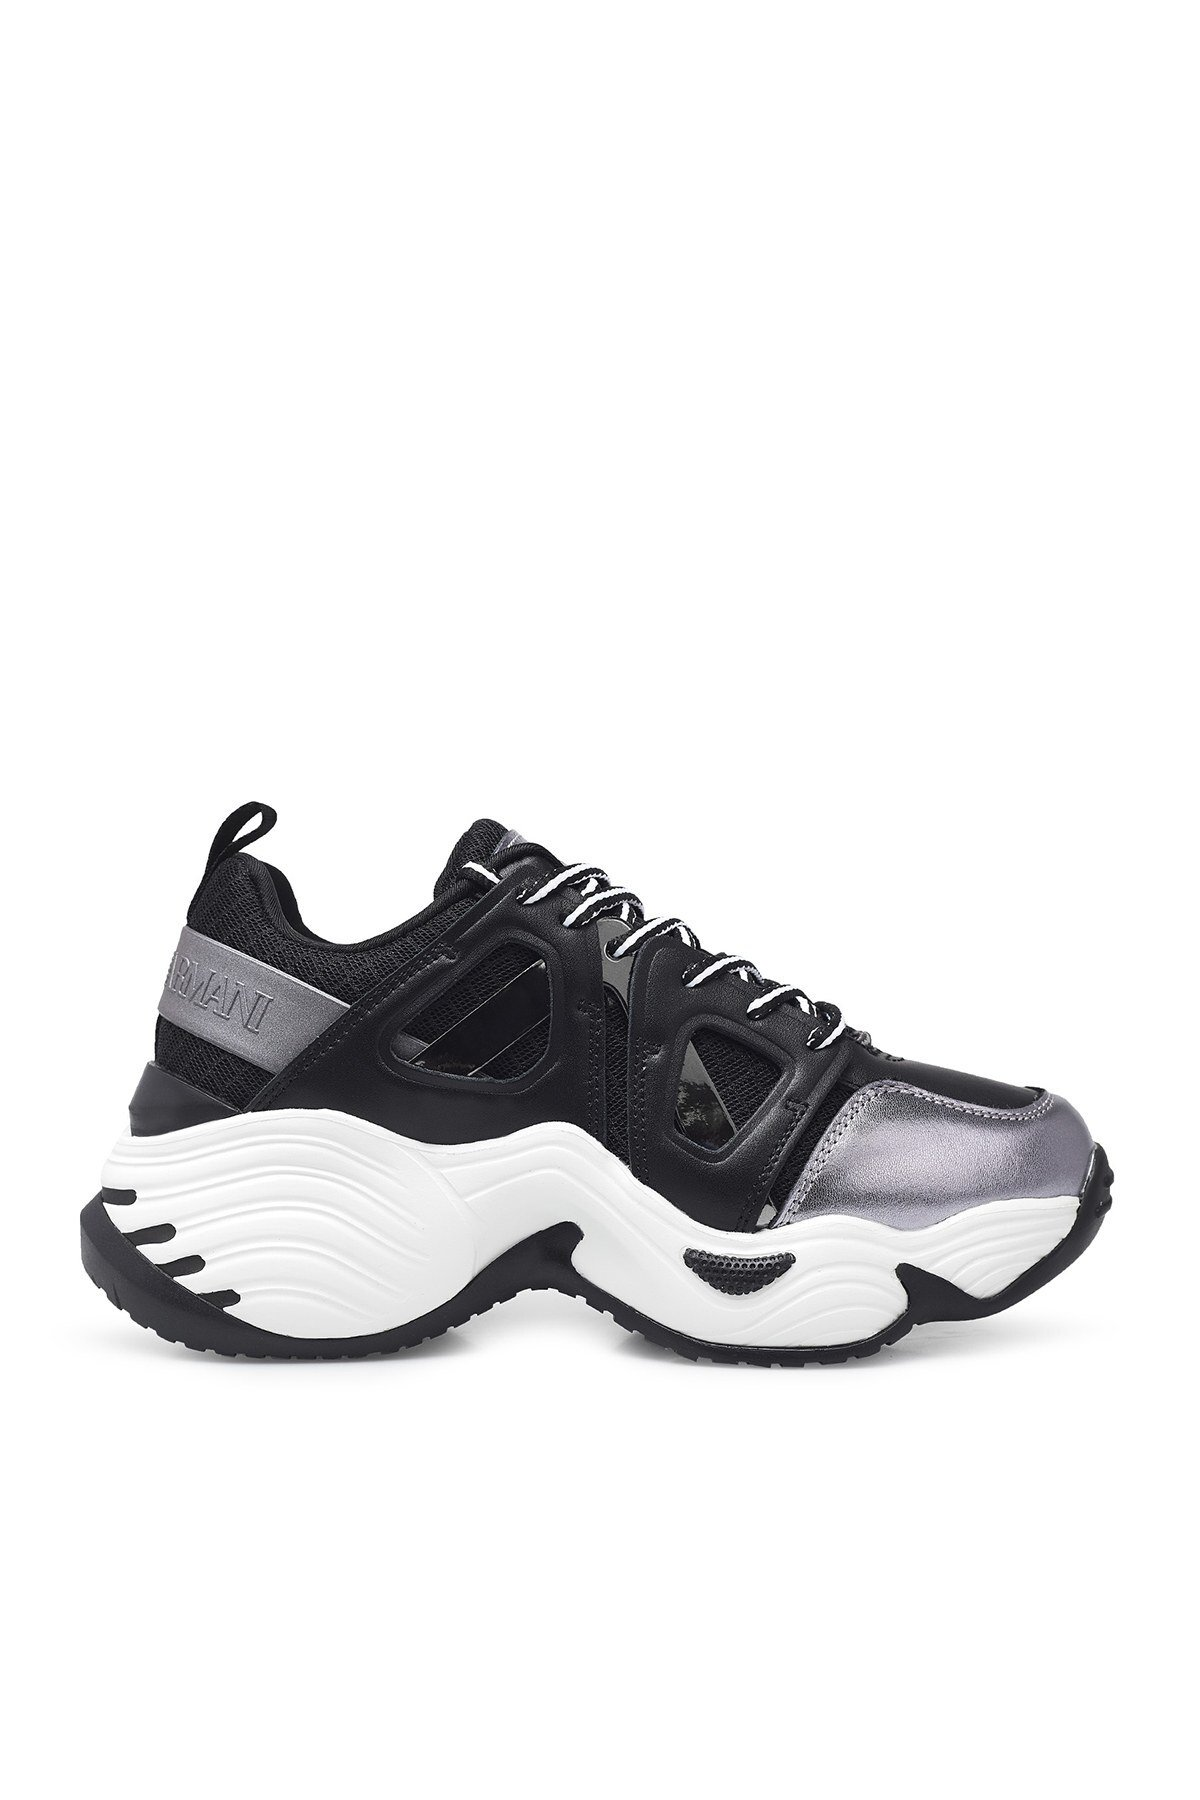 Emporio Armani Bayan Ayakkabı X3X099 XM583 R122 SİYAH